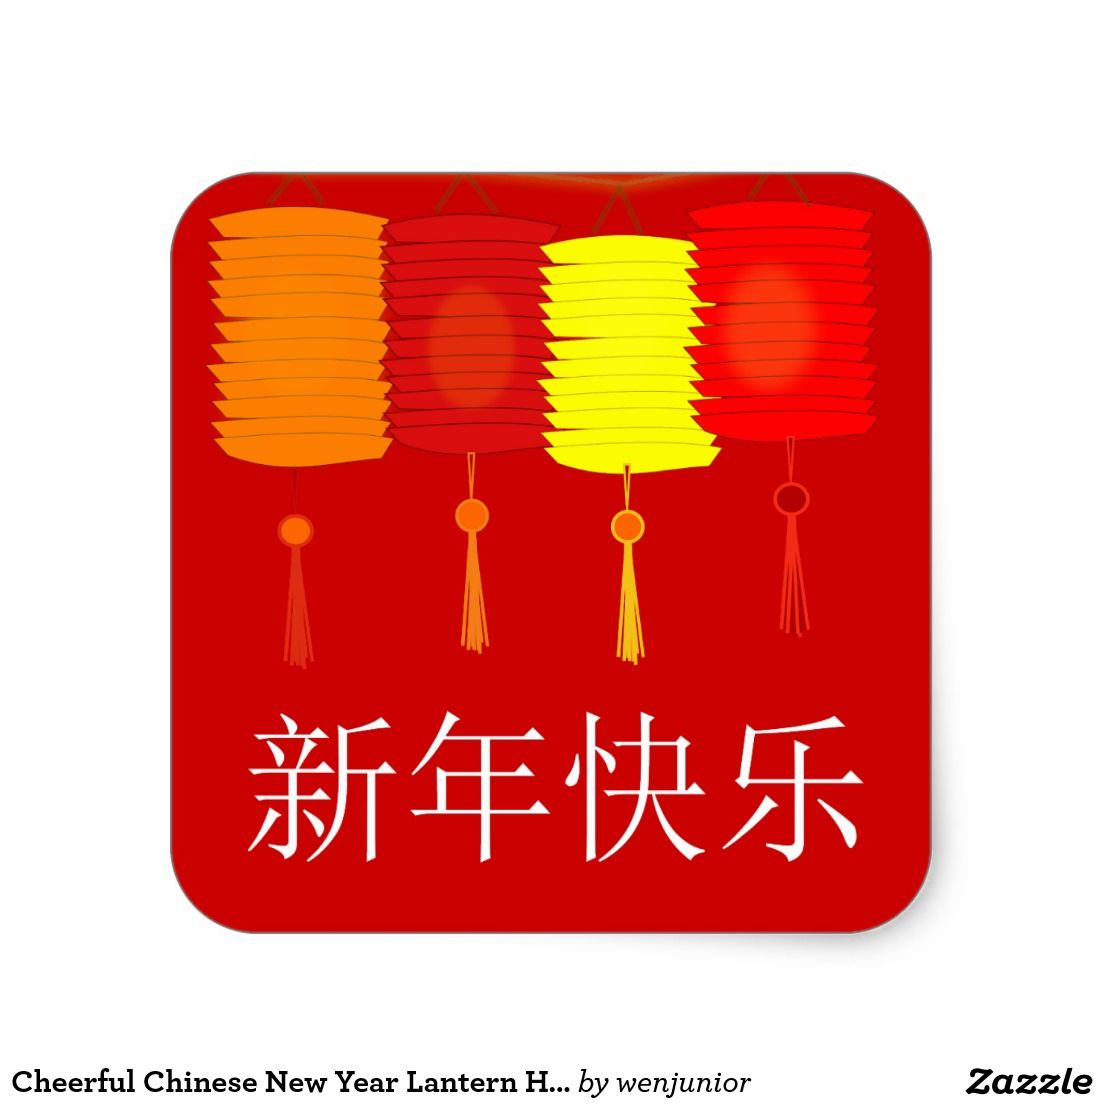 Cheerful Chinese New Year Lantern Holiday Theme Square